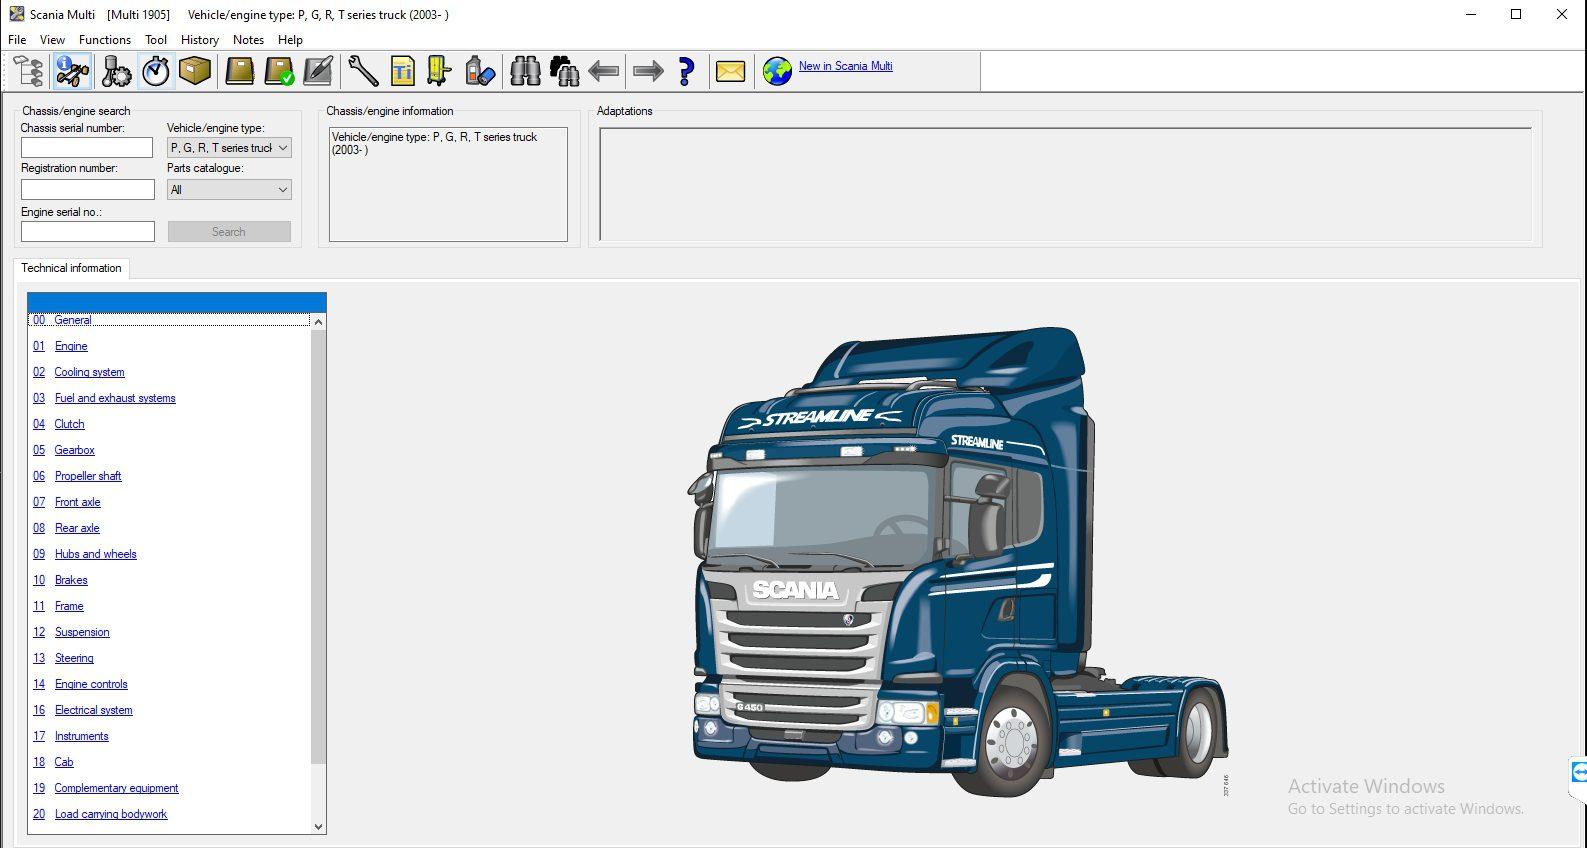 Scania_Multi_052019_Full_Instruction_2